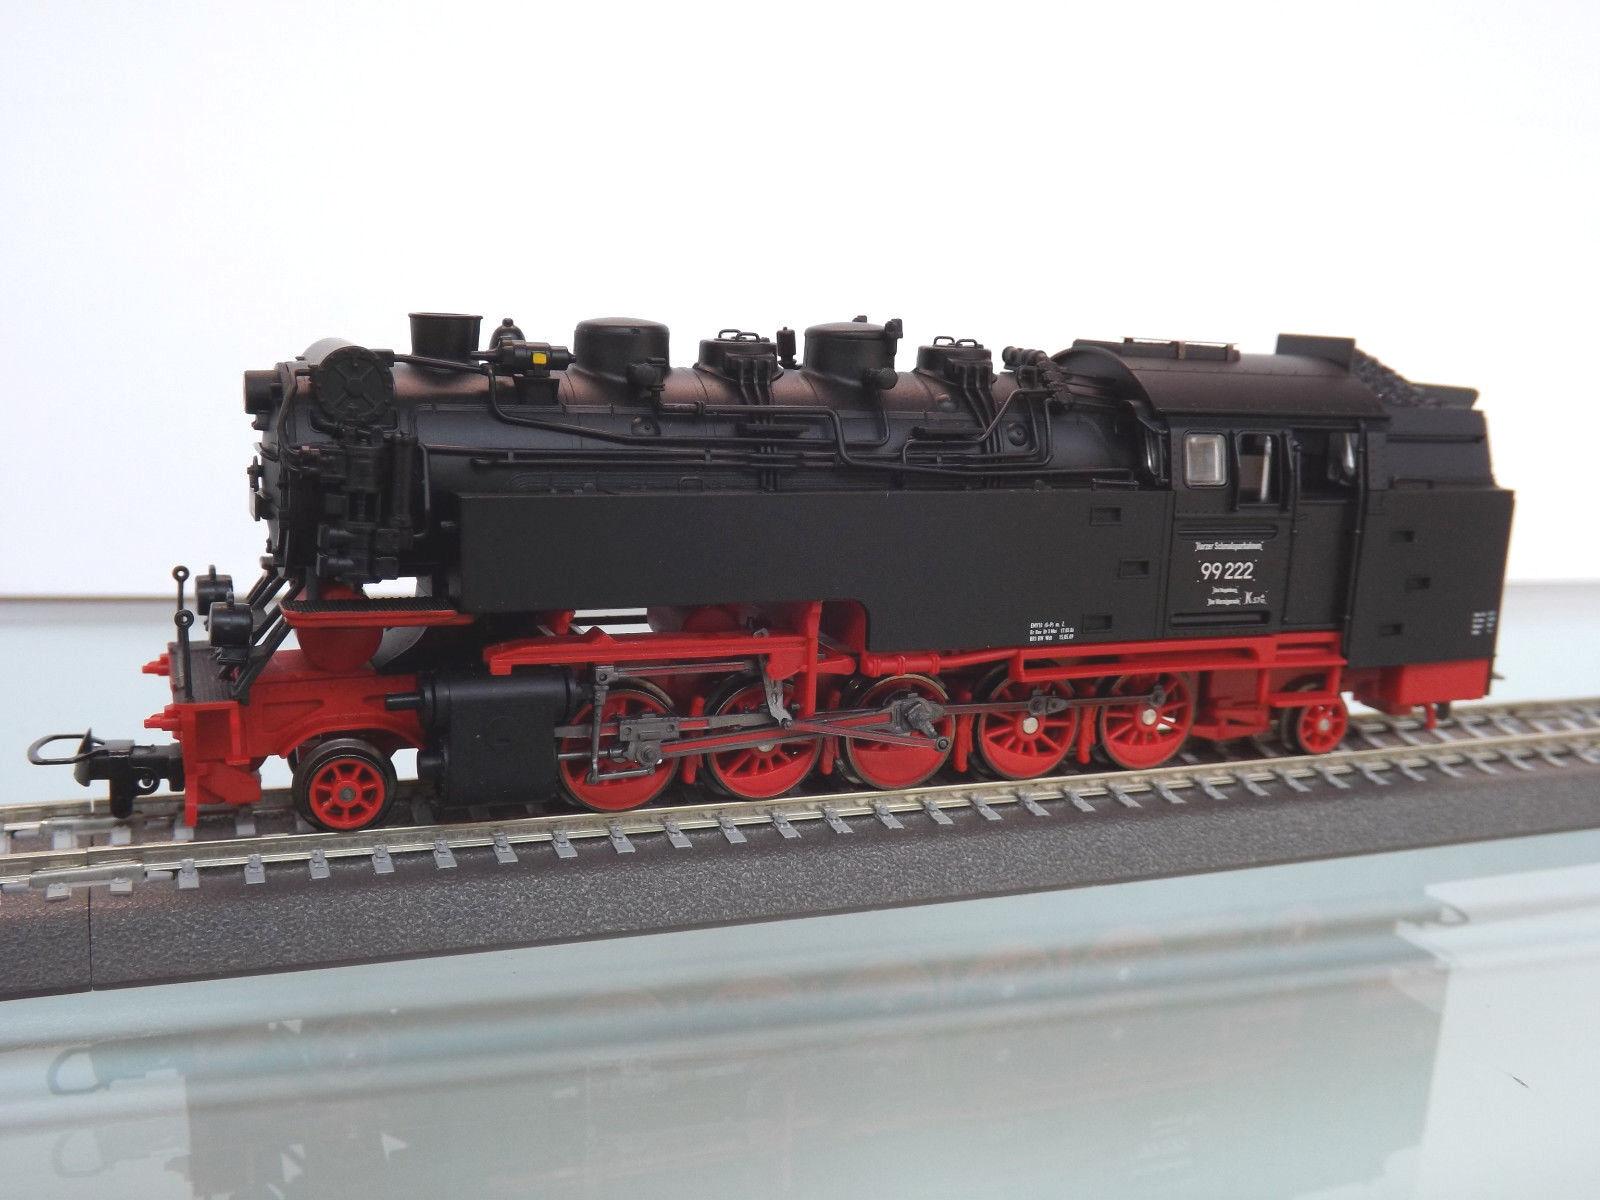 Tillig 02927 - vía Estrecha H0m - Locomotora de Vapor Br 99 222 Der Hsb , Ep.V -